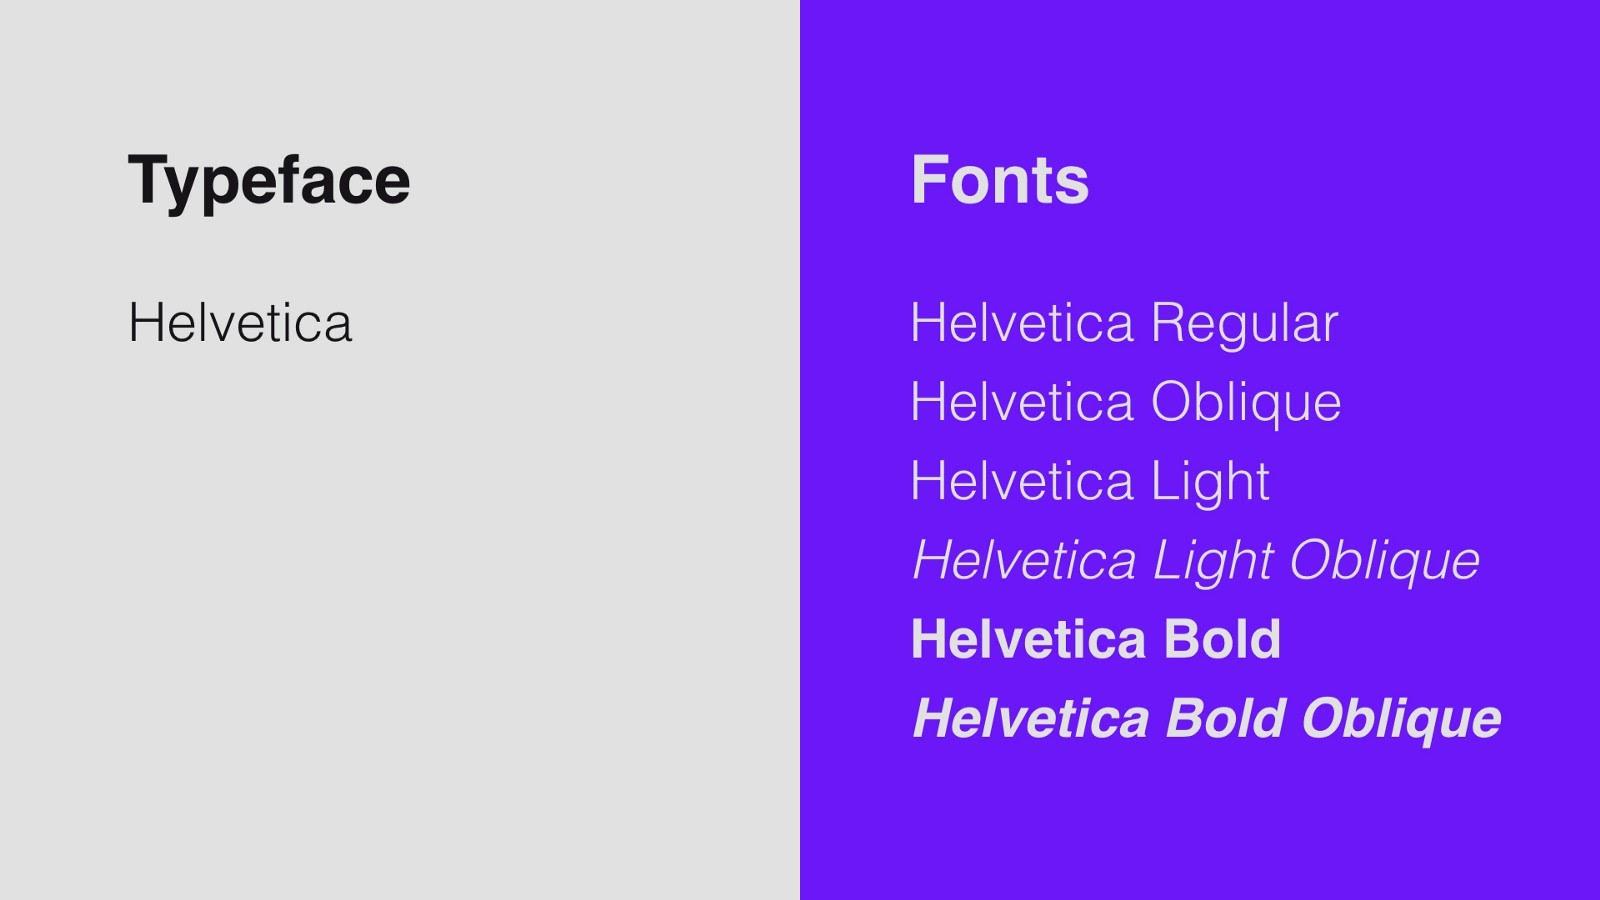 Typeface vs fonts